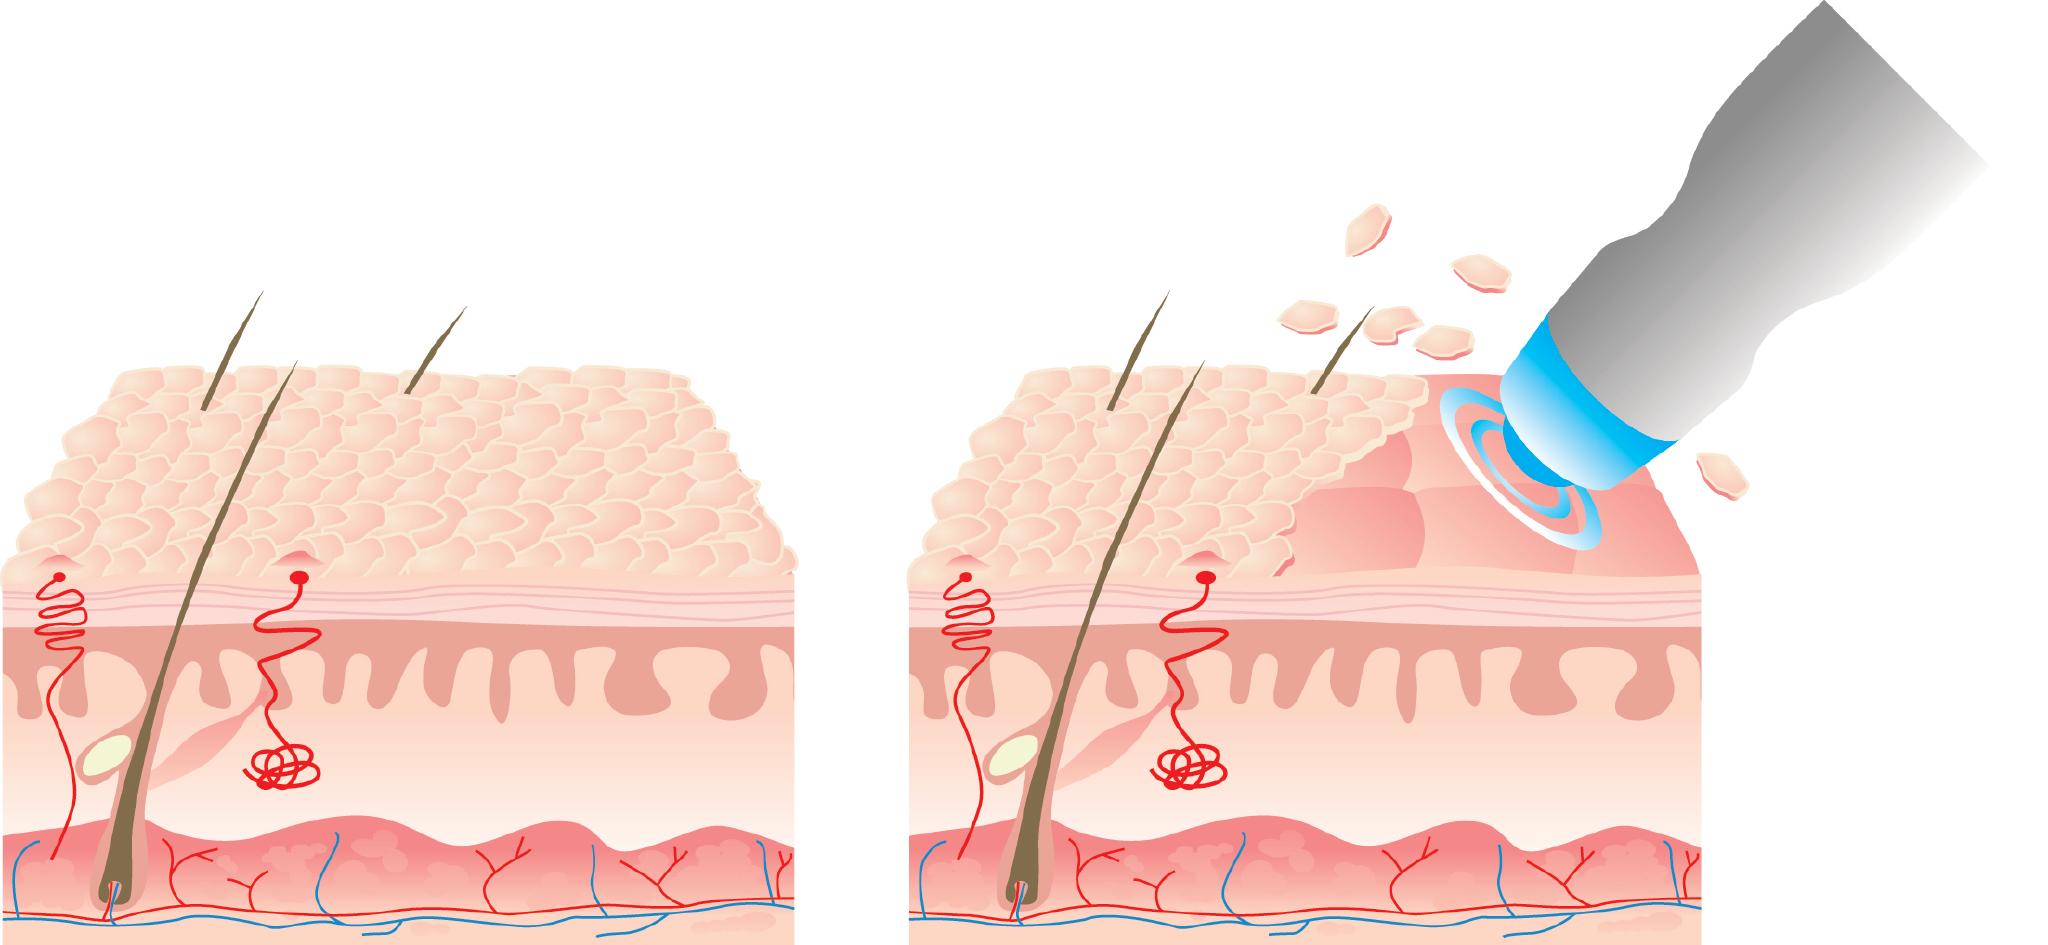 Microdermabrasion Diagram.jpg